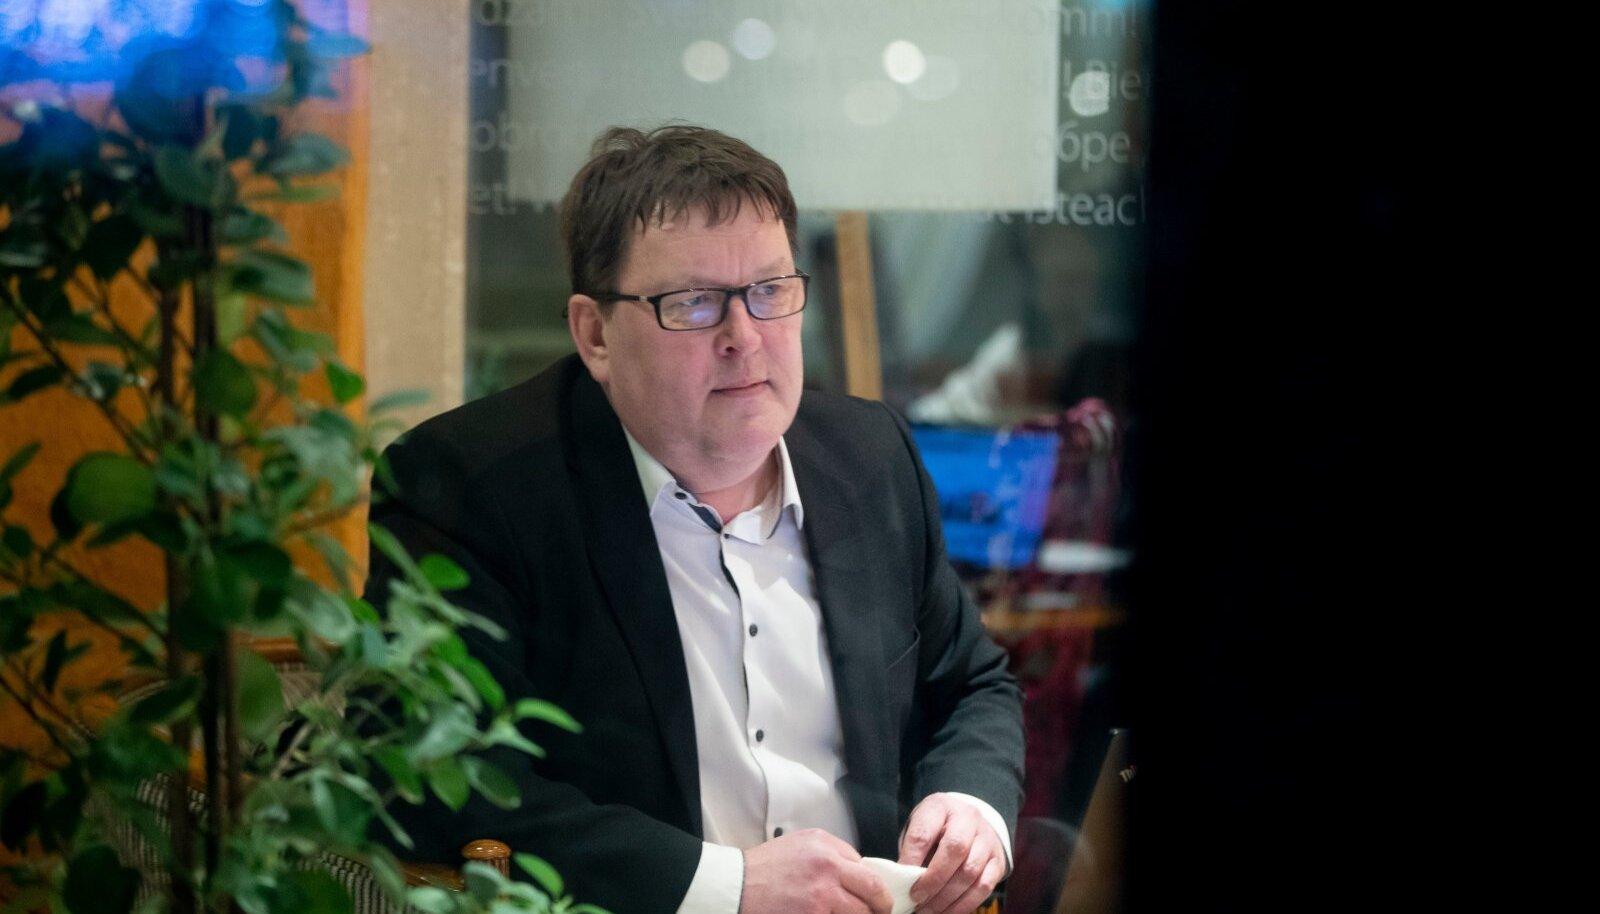 EVEA president Heiki Rits